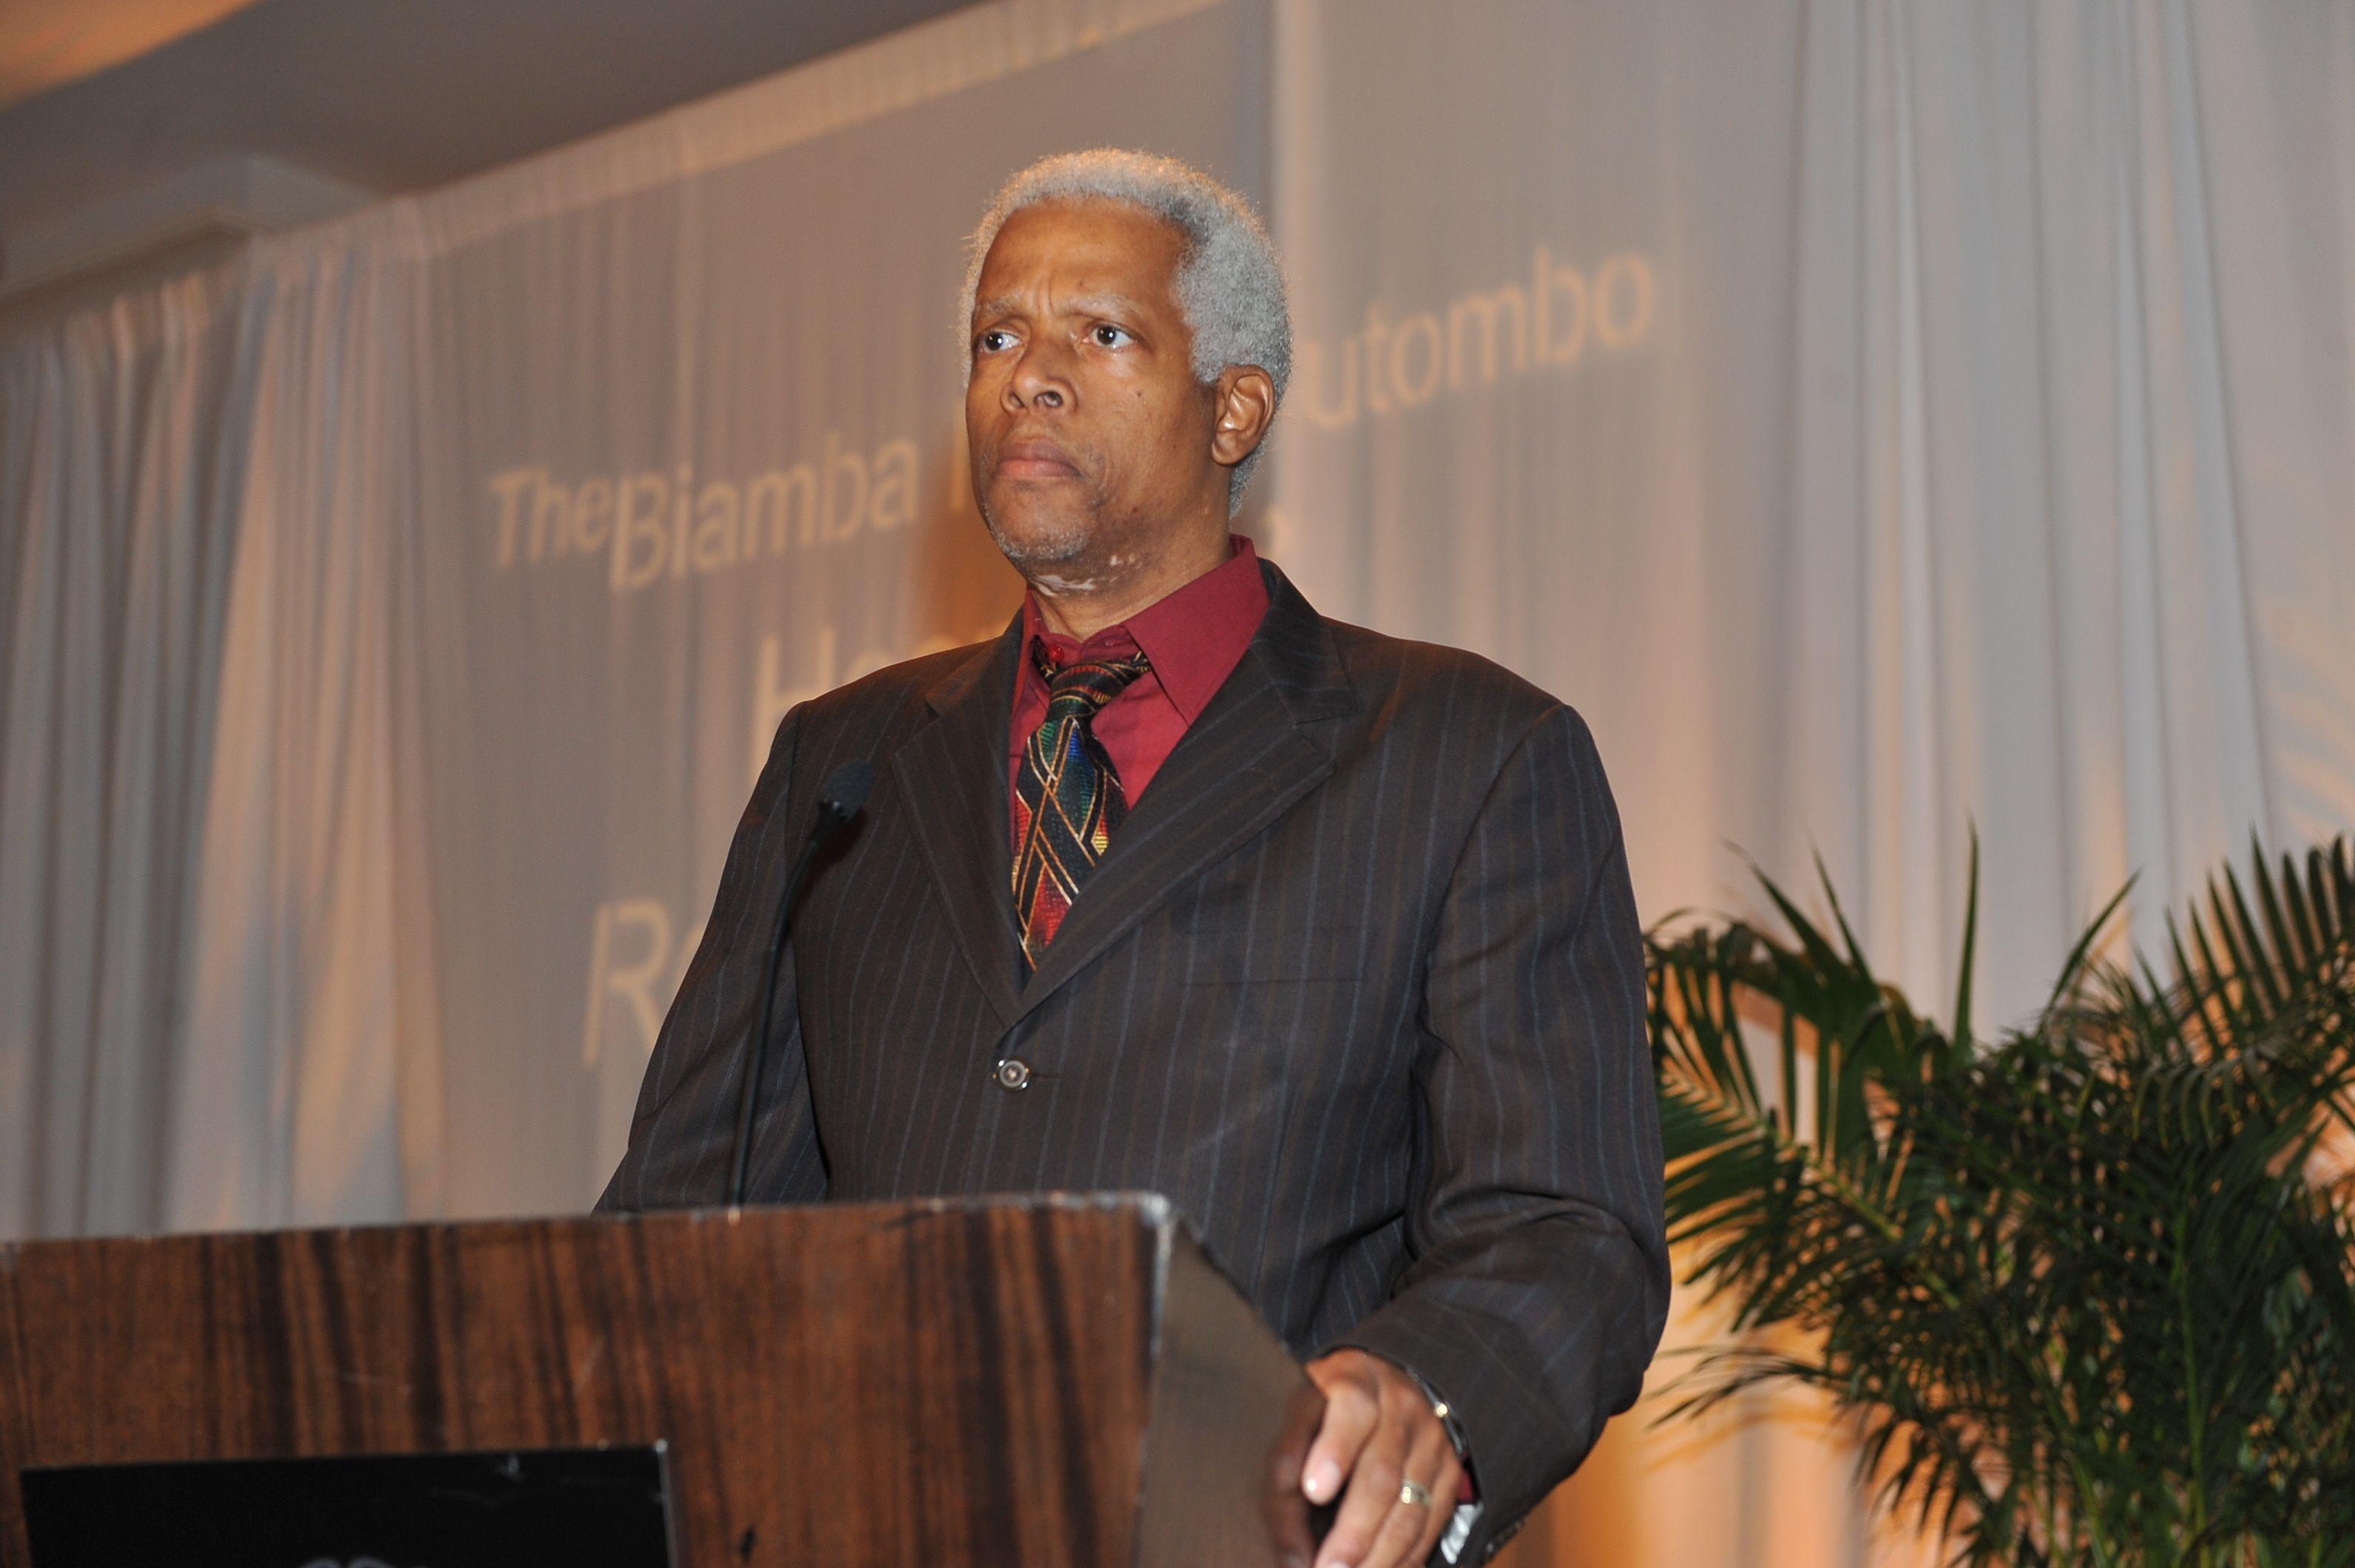 Congressman Hank Johnson attends the 2012 Caring for Congo gala at the ST Regis Atlanta in Atlanta, Ga., on April 28, 2012.